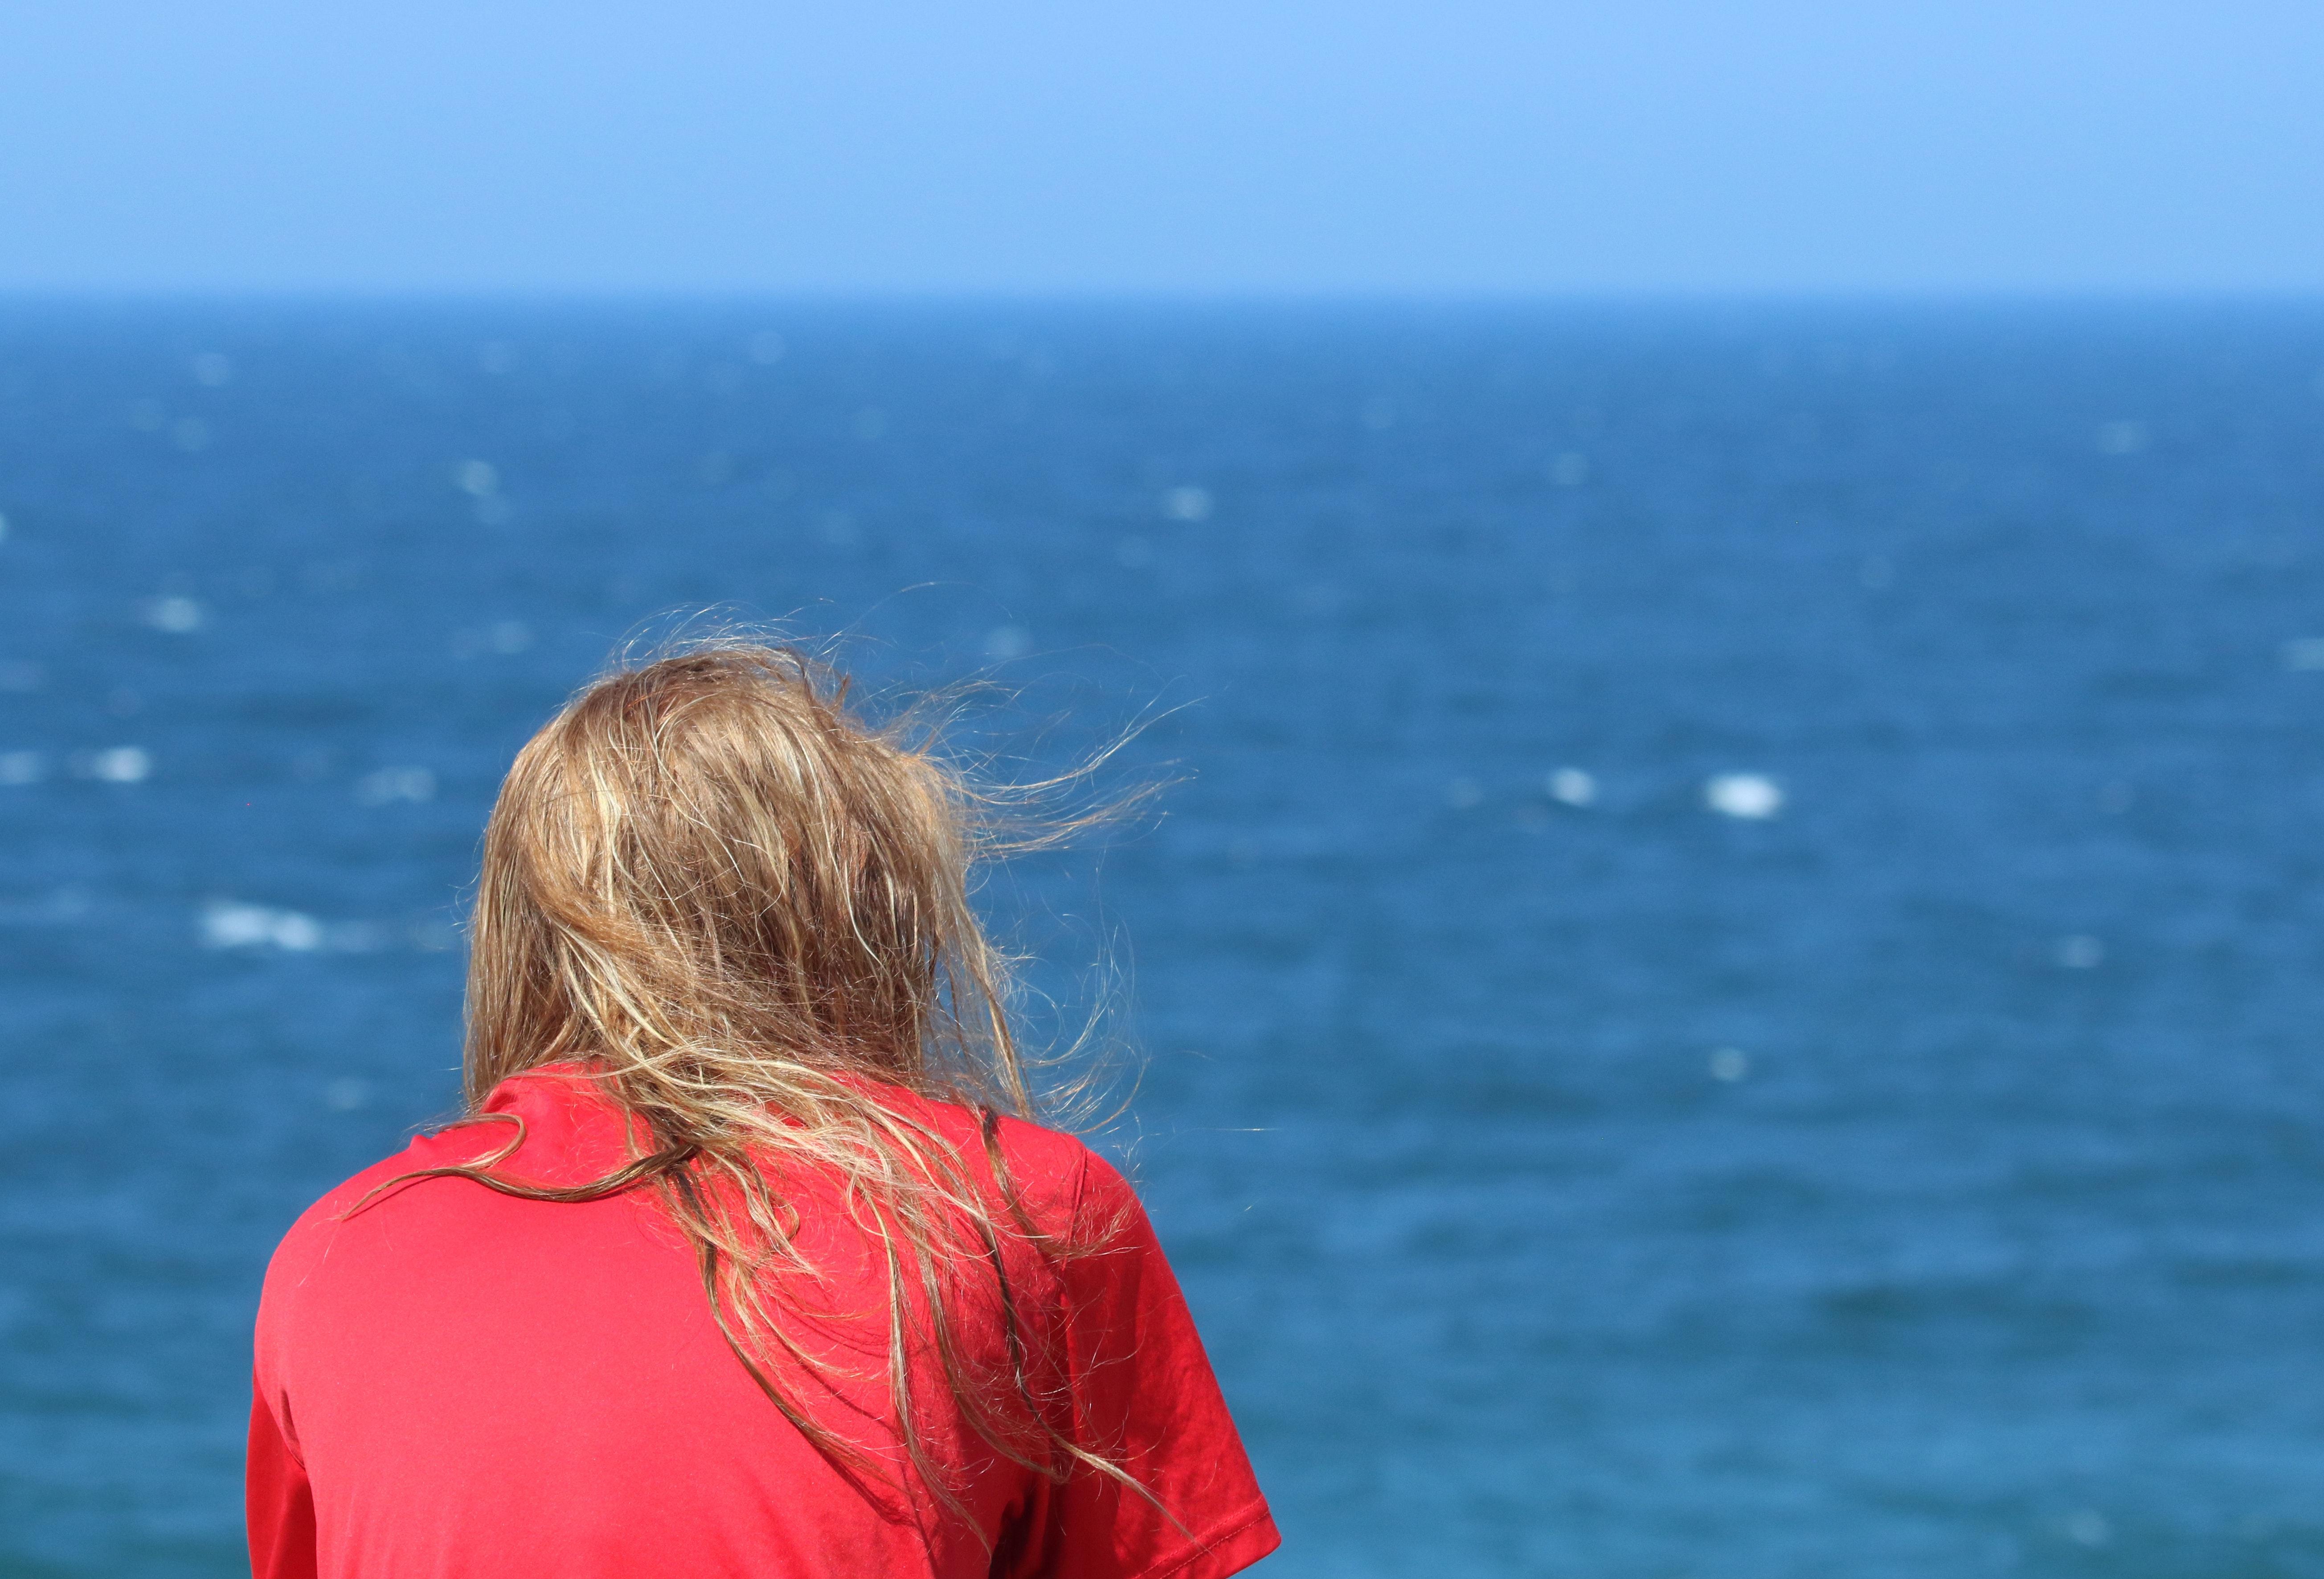 Person Wearing T-shirt Sitting Beside Seashore, Blonde hair, Daylight, Horizon, Ocean, HQ Photo